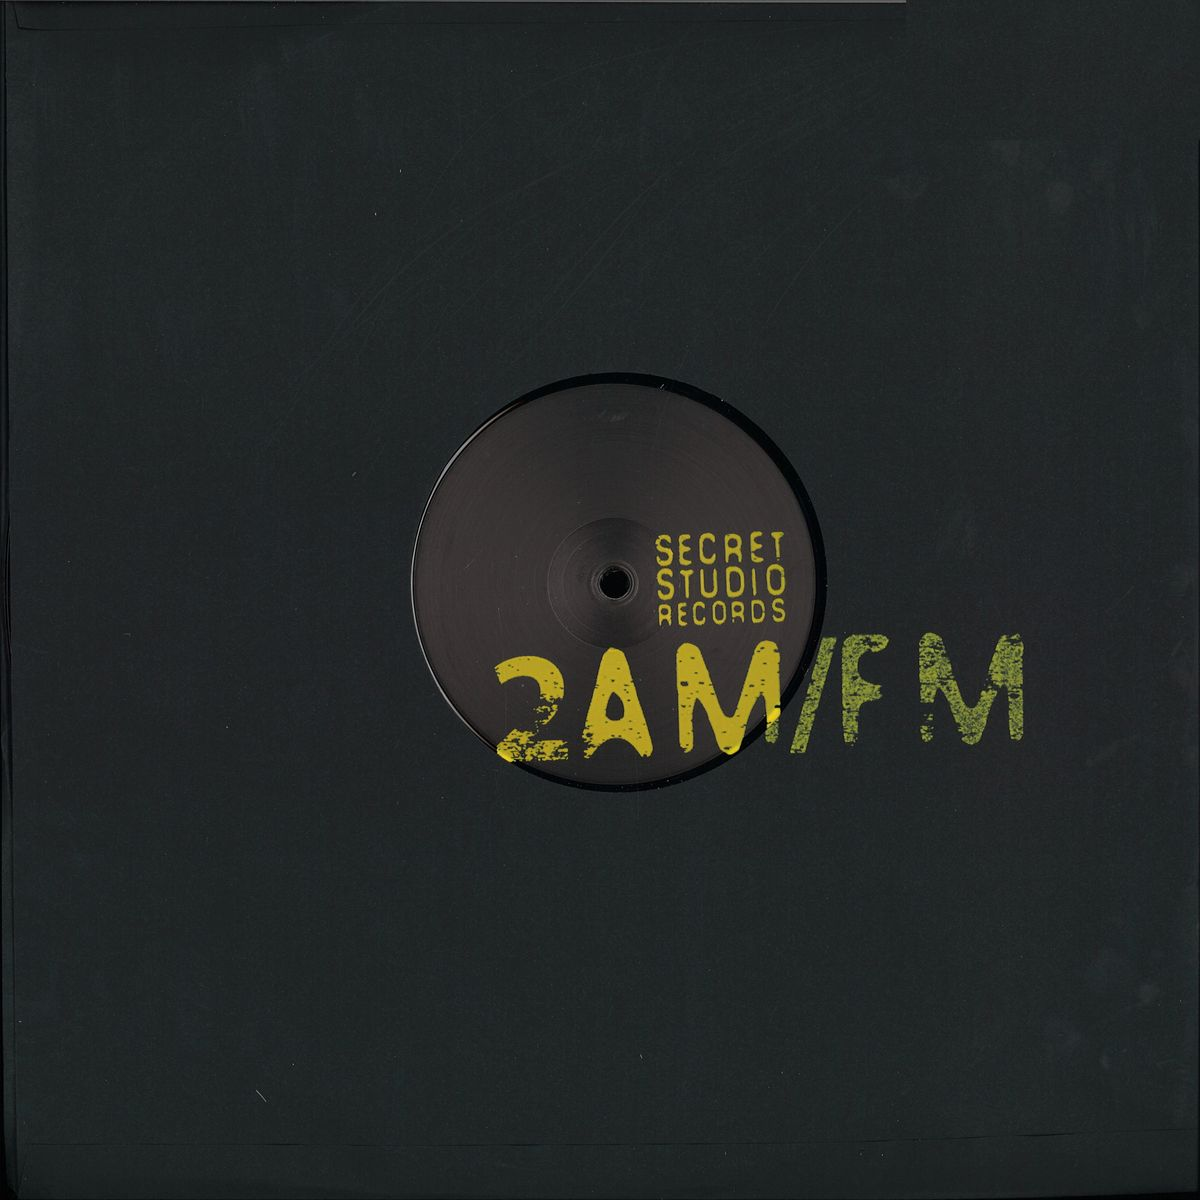 2AMFM - 2AMFM EP (Secret Studios)